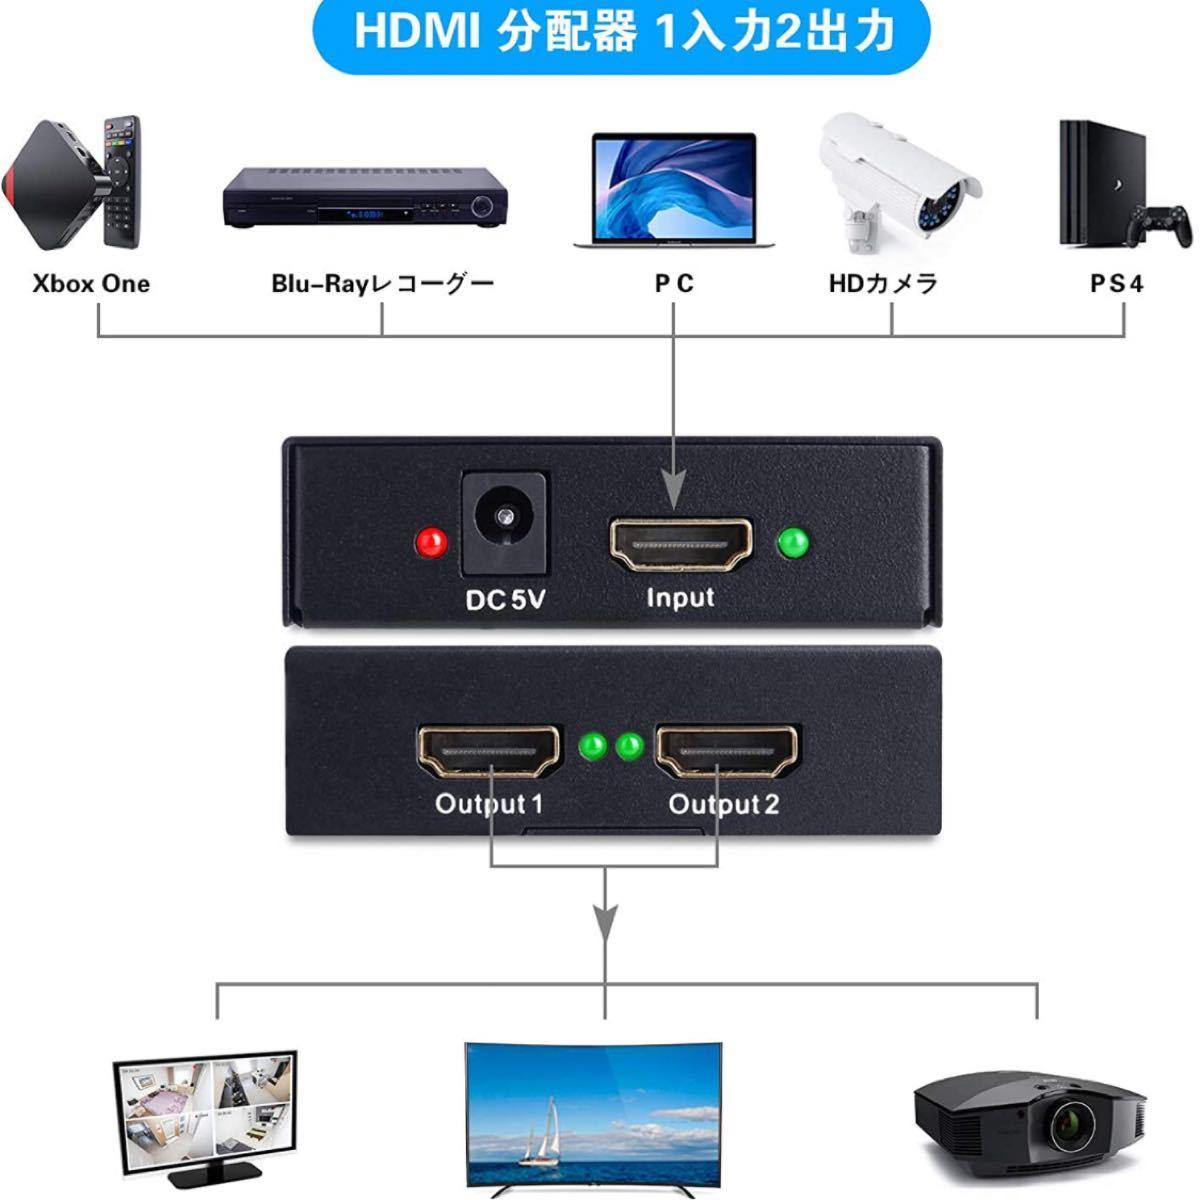 HDMI 分配器 1入力2出力 hdmi 分配器 同時出力HDMI スプリッター 4K@30Hz HDMI セレクター 同時出力